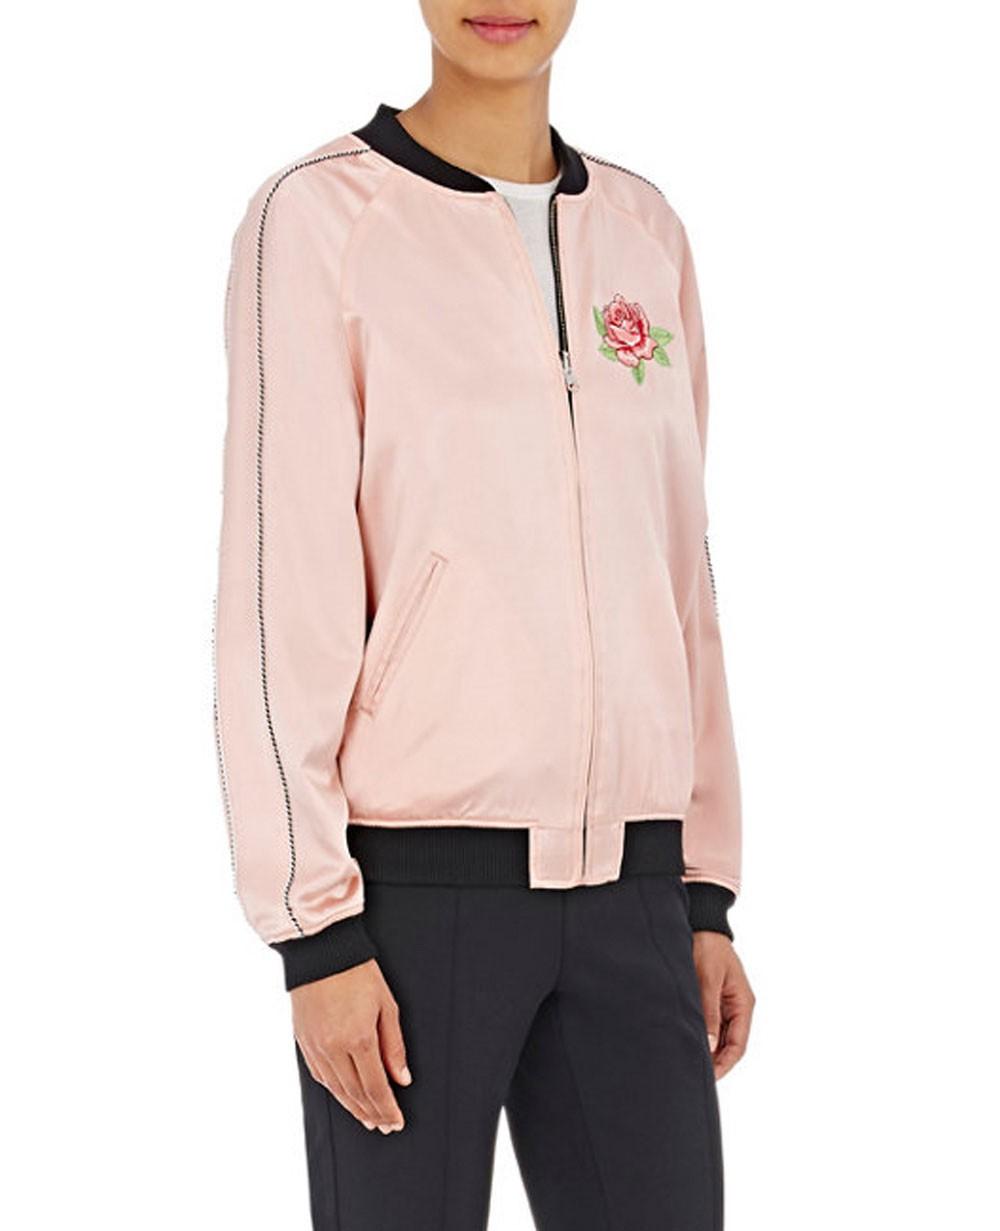 Women Zipper Reversible Varsity Jacket